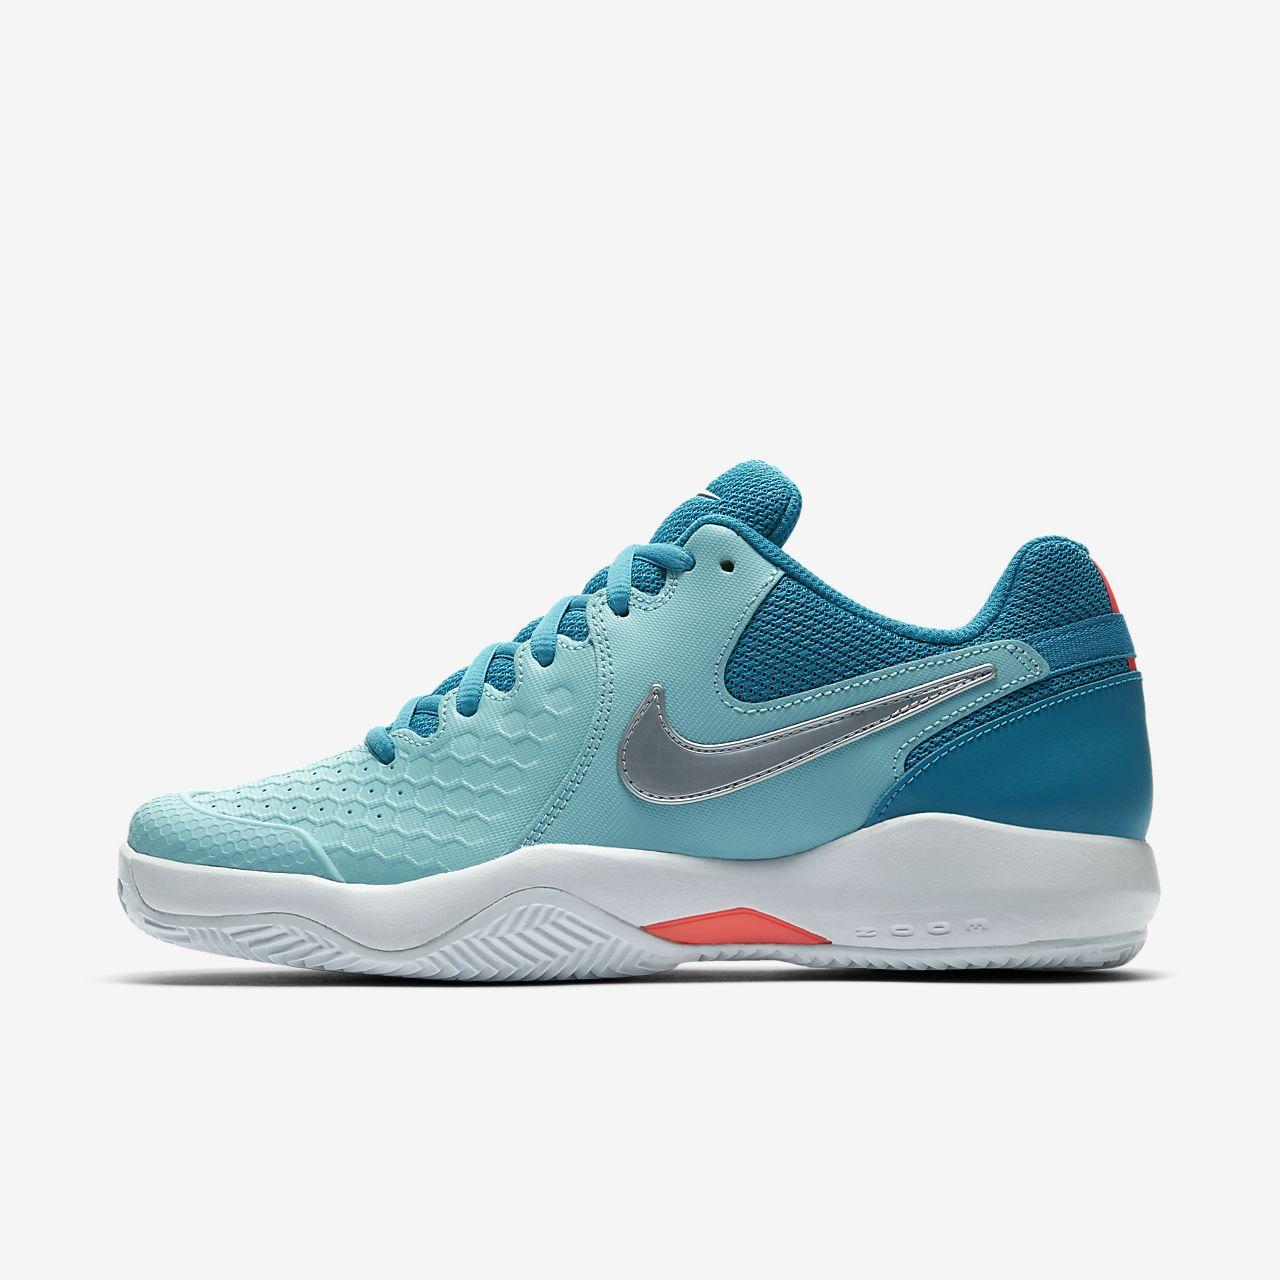 Nike Argile Tribunal Résistance Zoom Air vfqQZOu